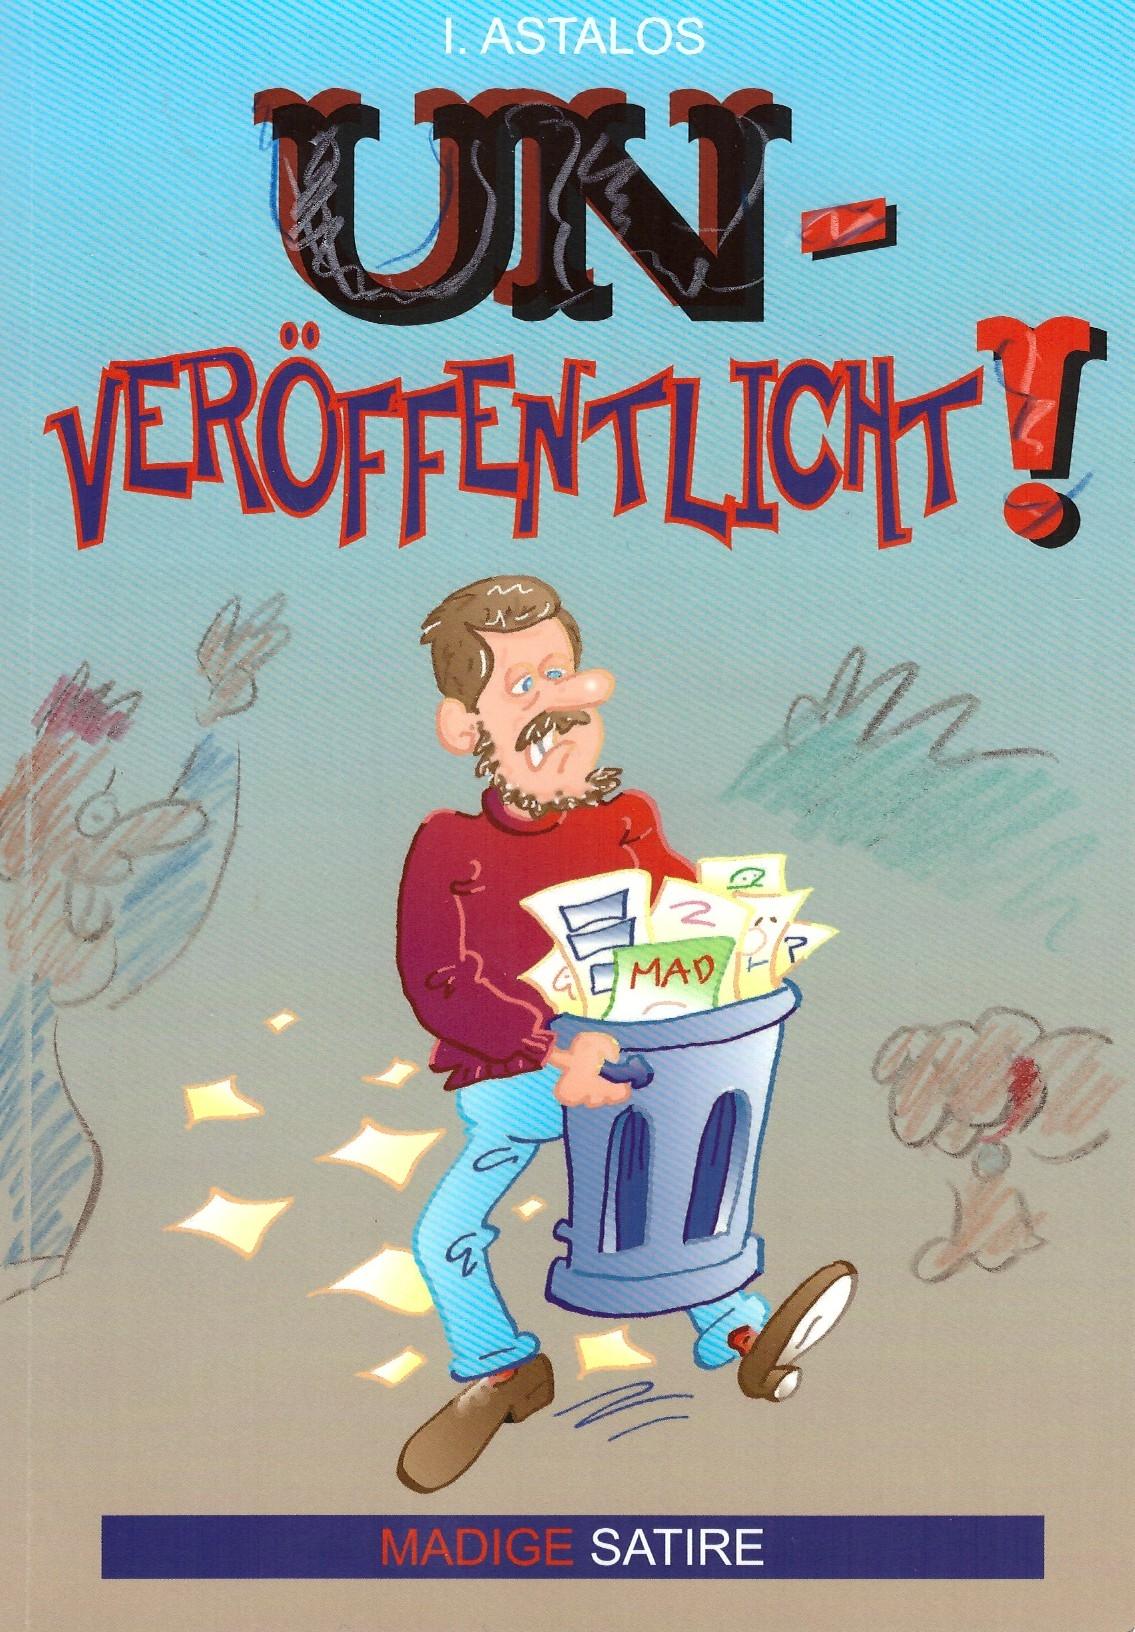 UN-Veröffentlicht! • Germany • 2nd Edition - Dino/Panini